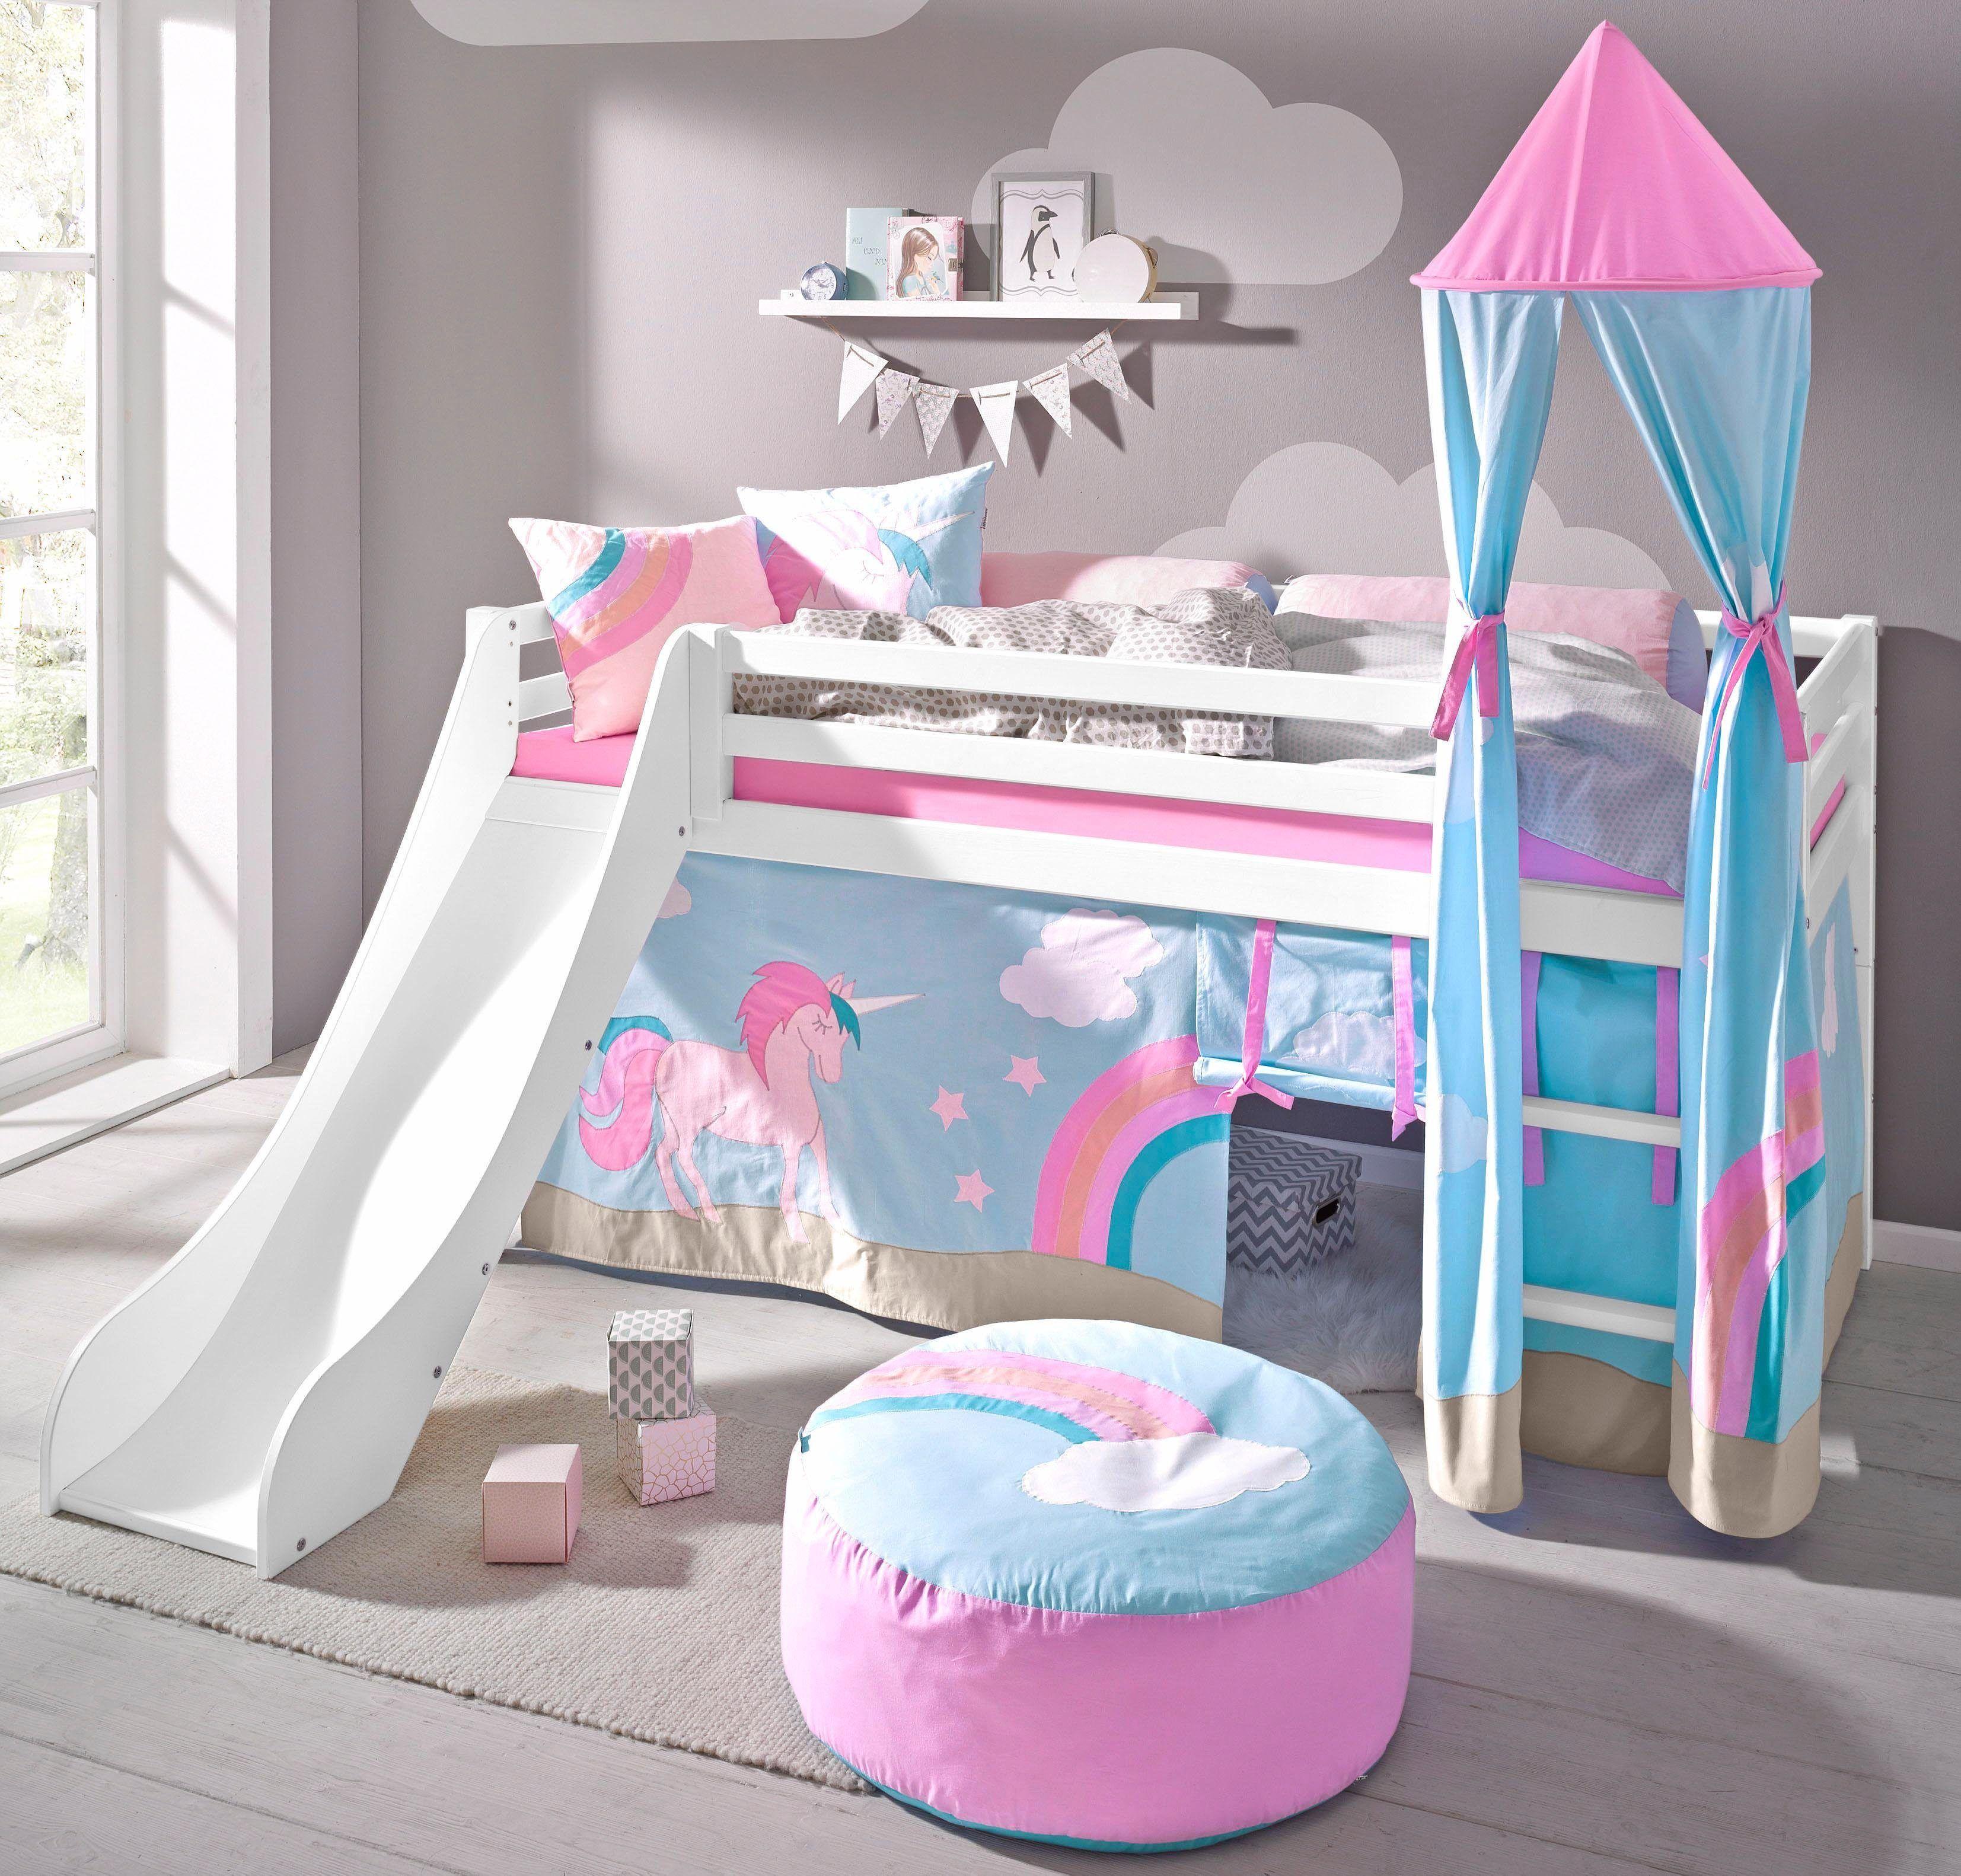 Hoppekids Turm Rosa Einhorn Jetzt Bestellen Unter Https Moebel Ladendirekt De Kinderzimmer Betten Baldach Children Room Girl Bed For Girls Room Girl Room